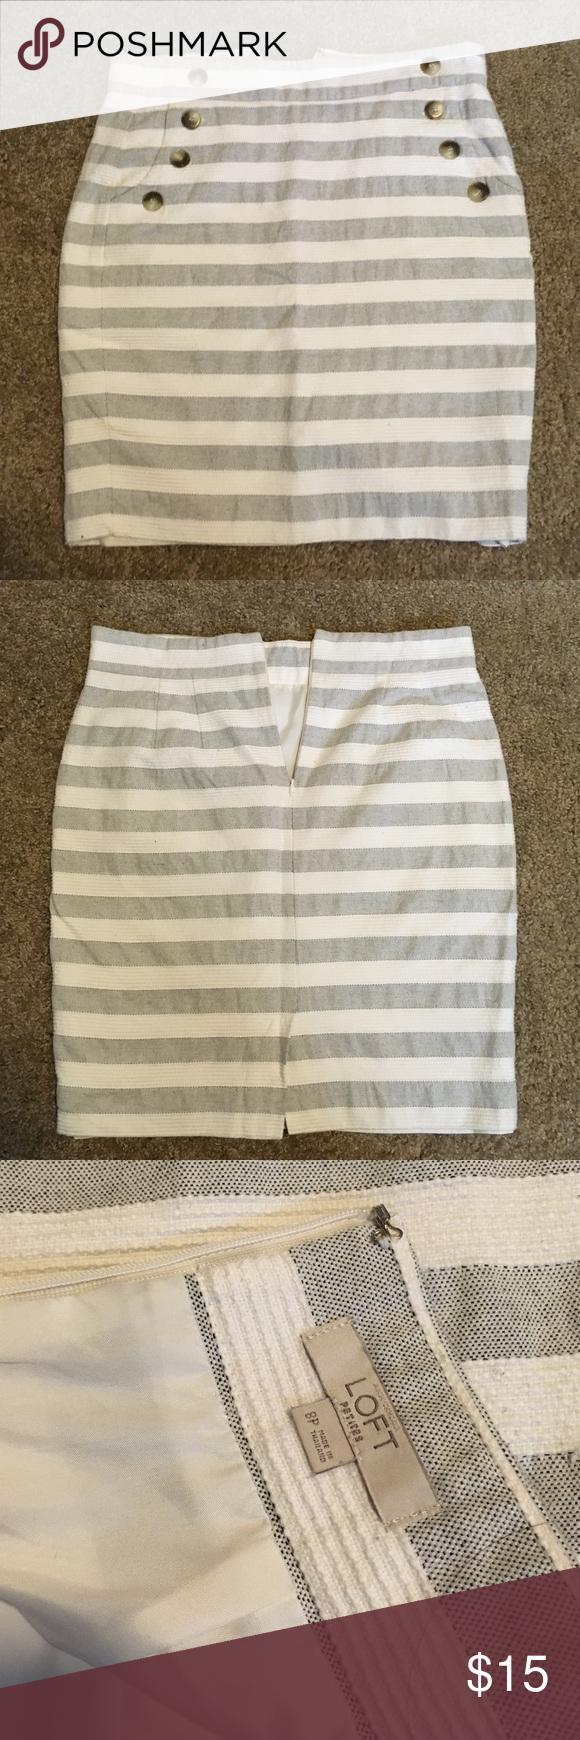 Gray Youth Group Rooms: Striped Loft Side Pocket Skirt. Size 8P Striped Loft Skirt